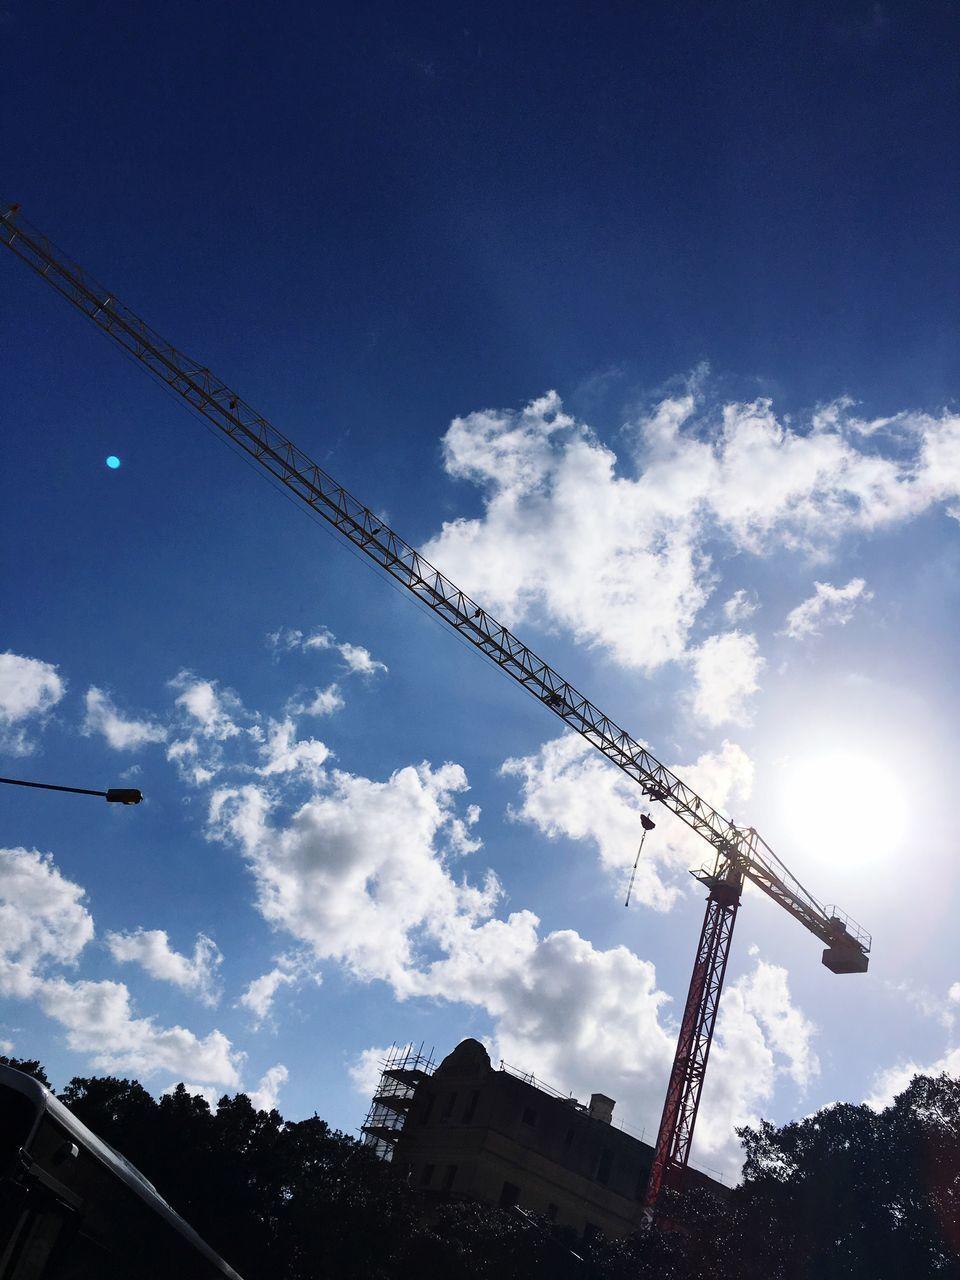 crane - construction machinery, sky, low angle view, construction site, built structure, development, architecture, cloud - sky, crane, building exterior, silhouette, construction industry, construction, industry, tall - high, cloud, dusk, outdoors, incomplete, blue